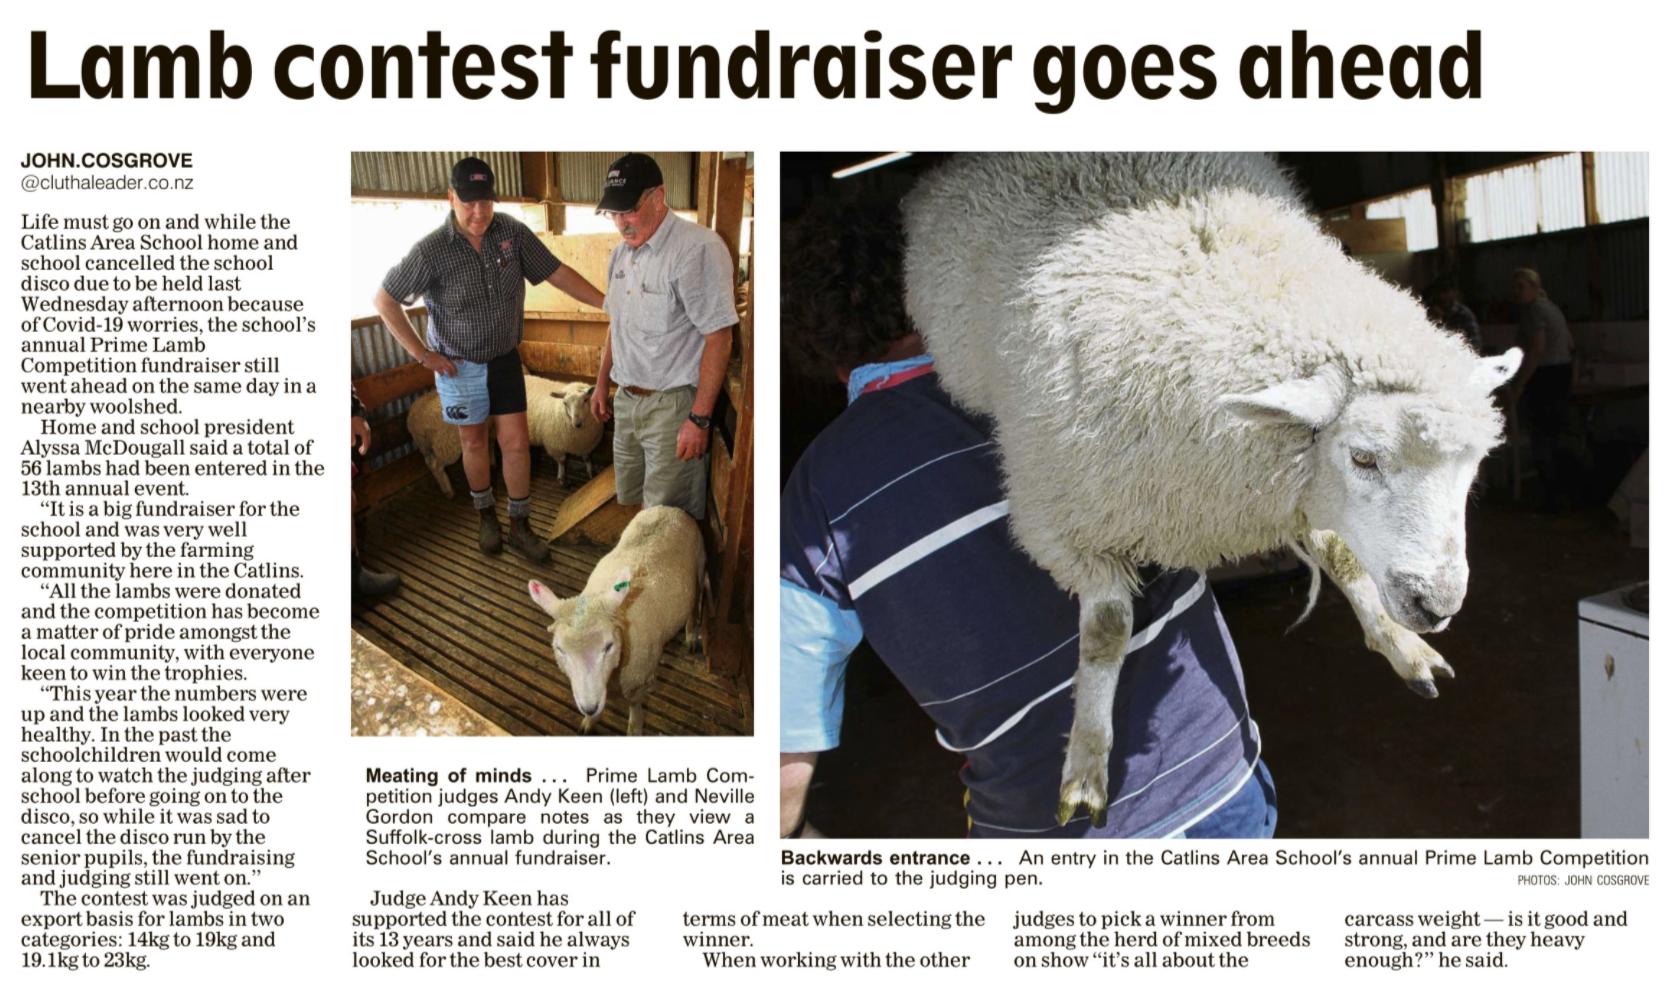 Prime Lamb Competition